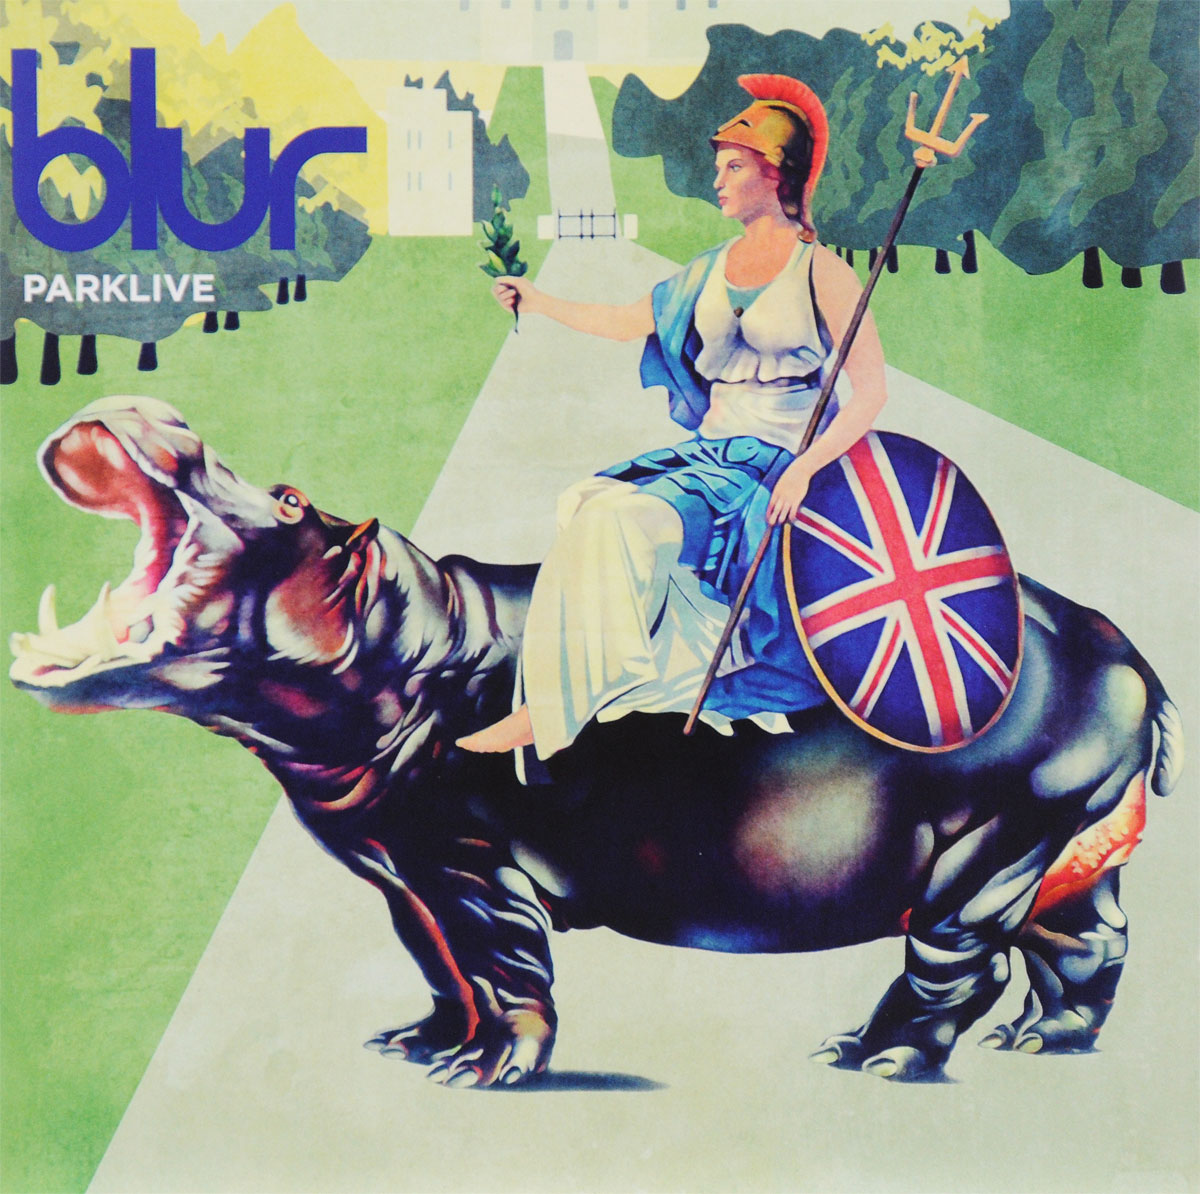 Blur,Blurt Blur. Parklive. Live In Hyde Park - 12th August 2012 (2 CD) blur blur the best of blur